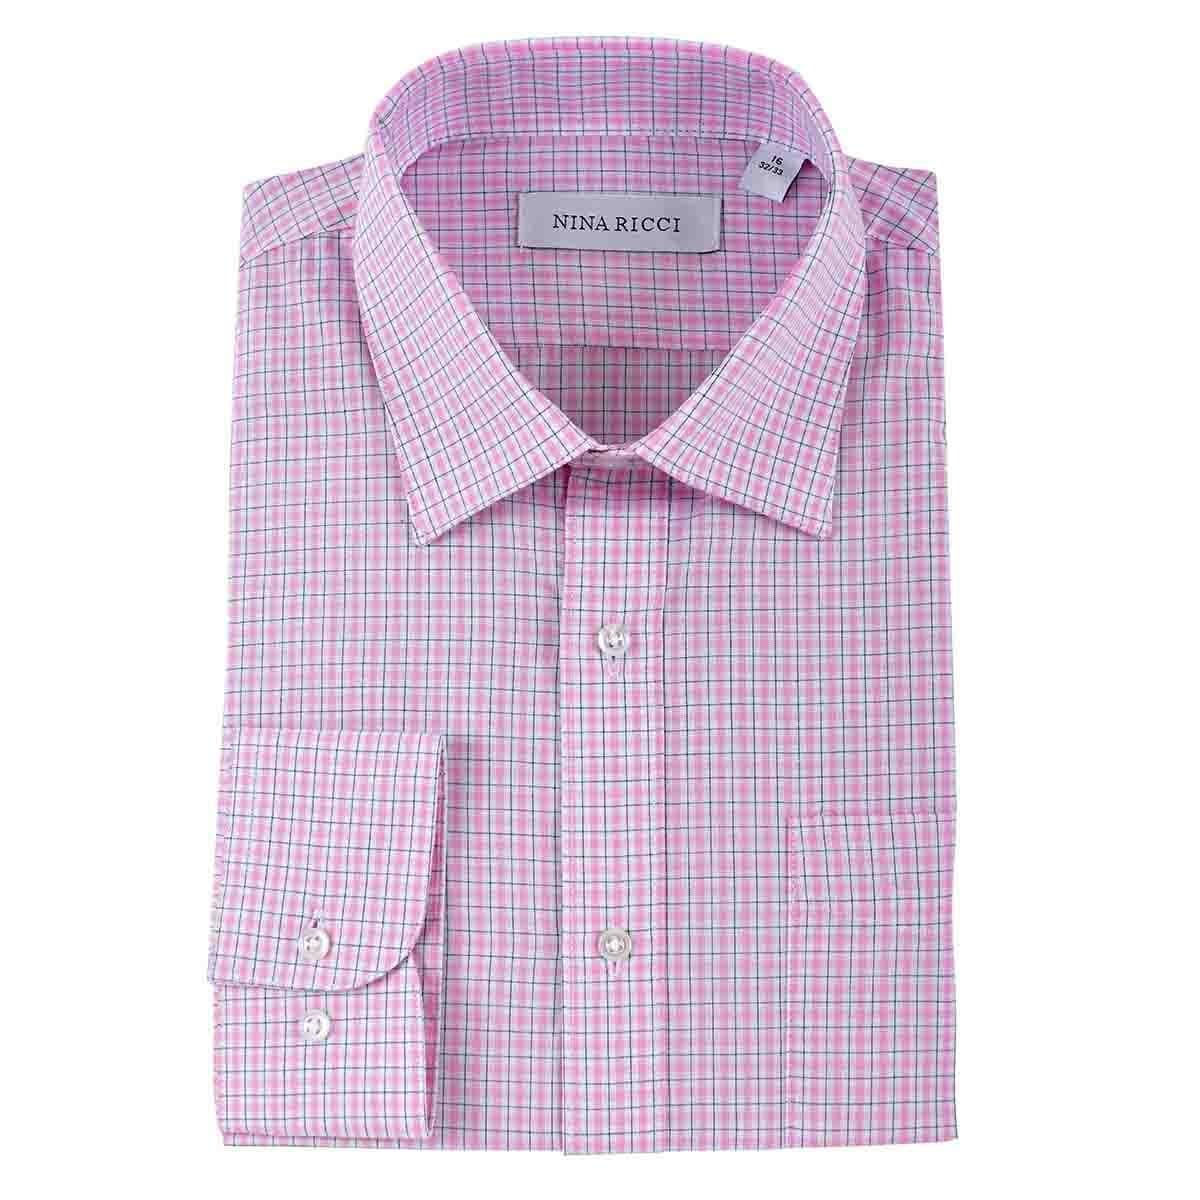 Camisa de Vestir Manga Larga Rosa Combinado Nina Ricci